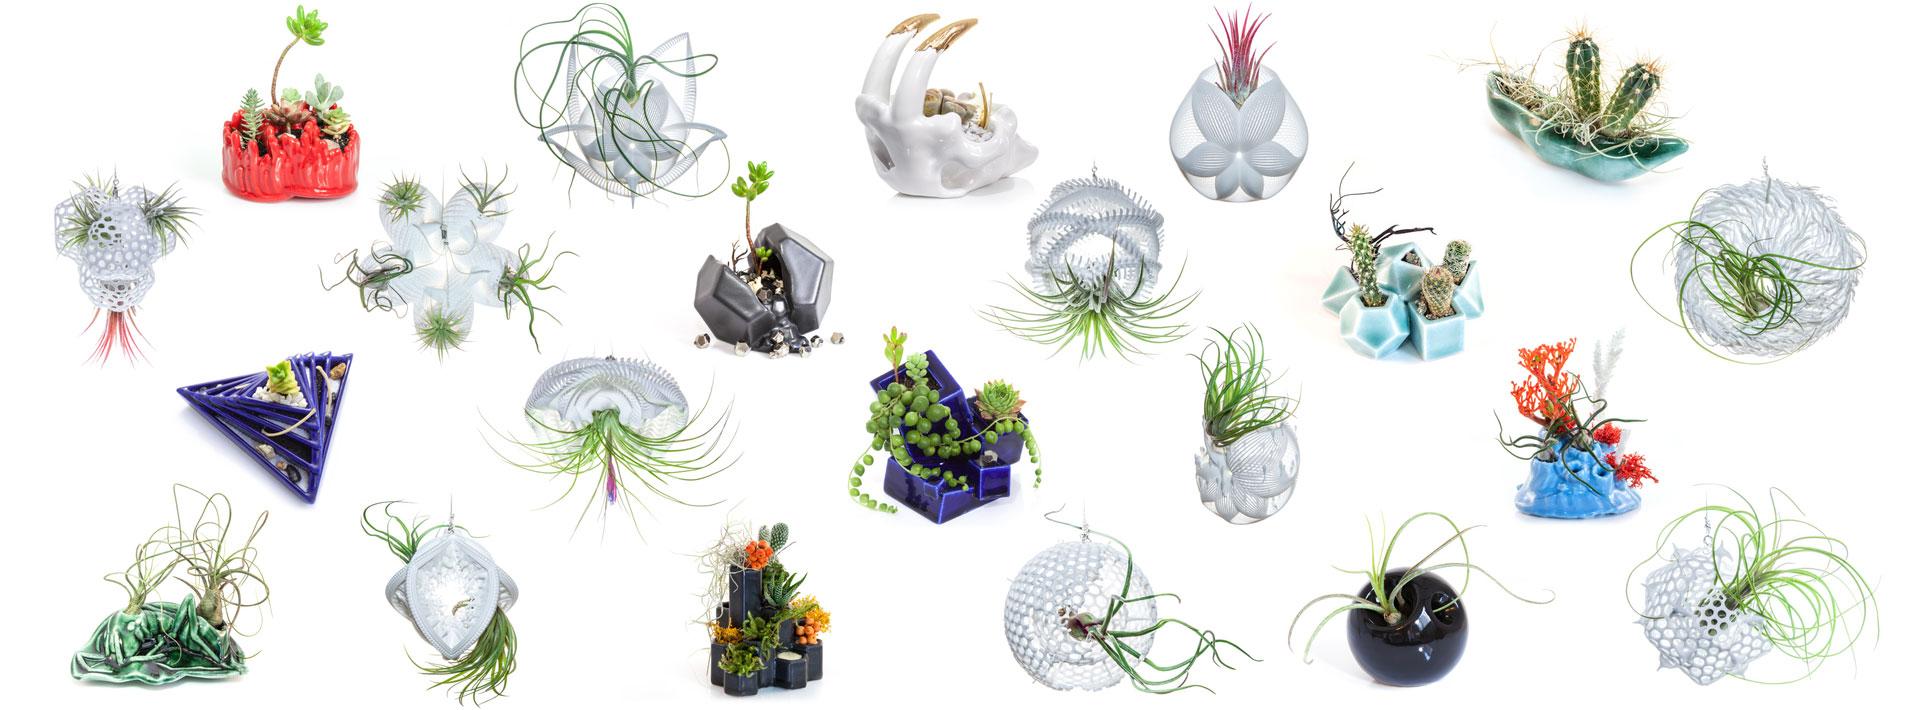 planters_all.jpg